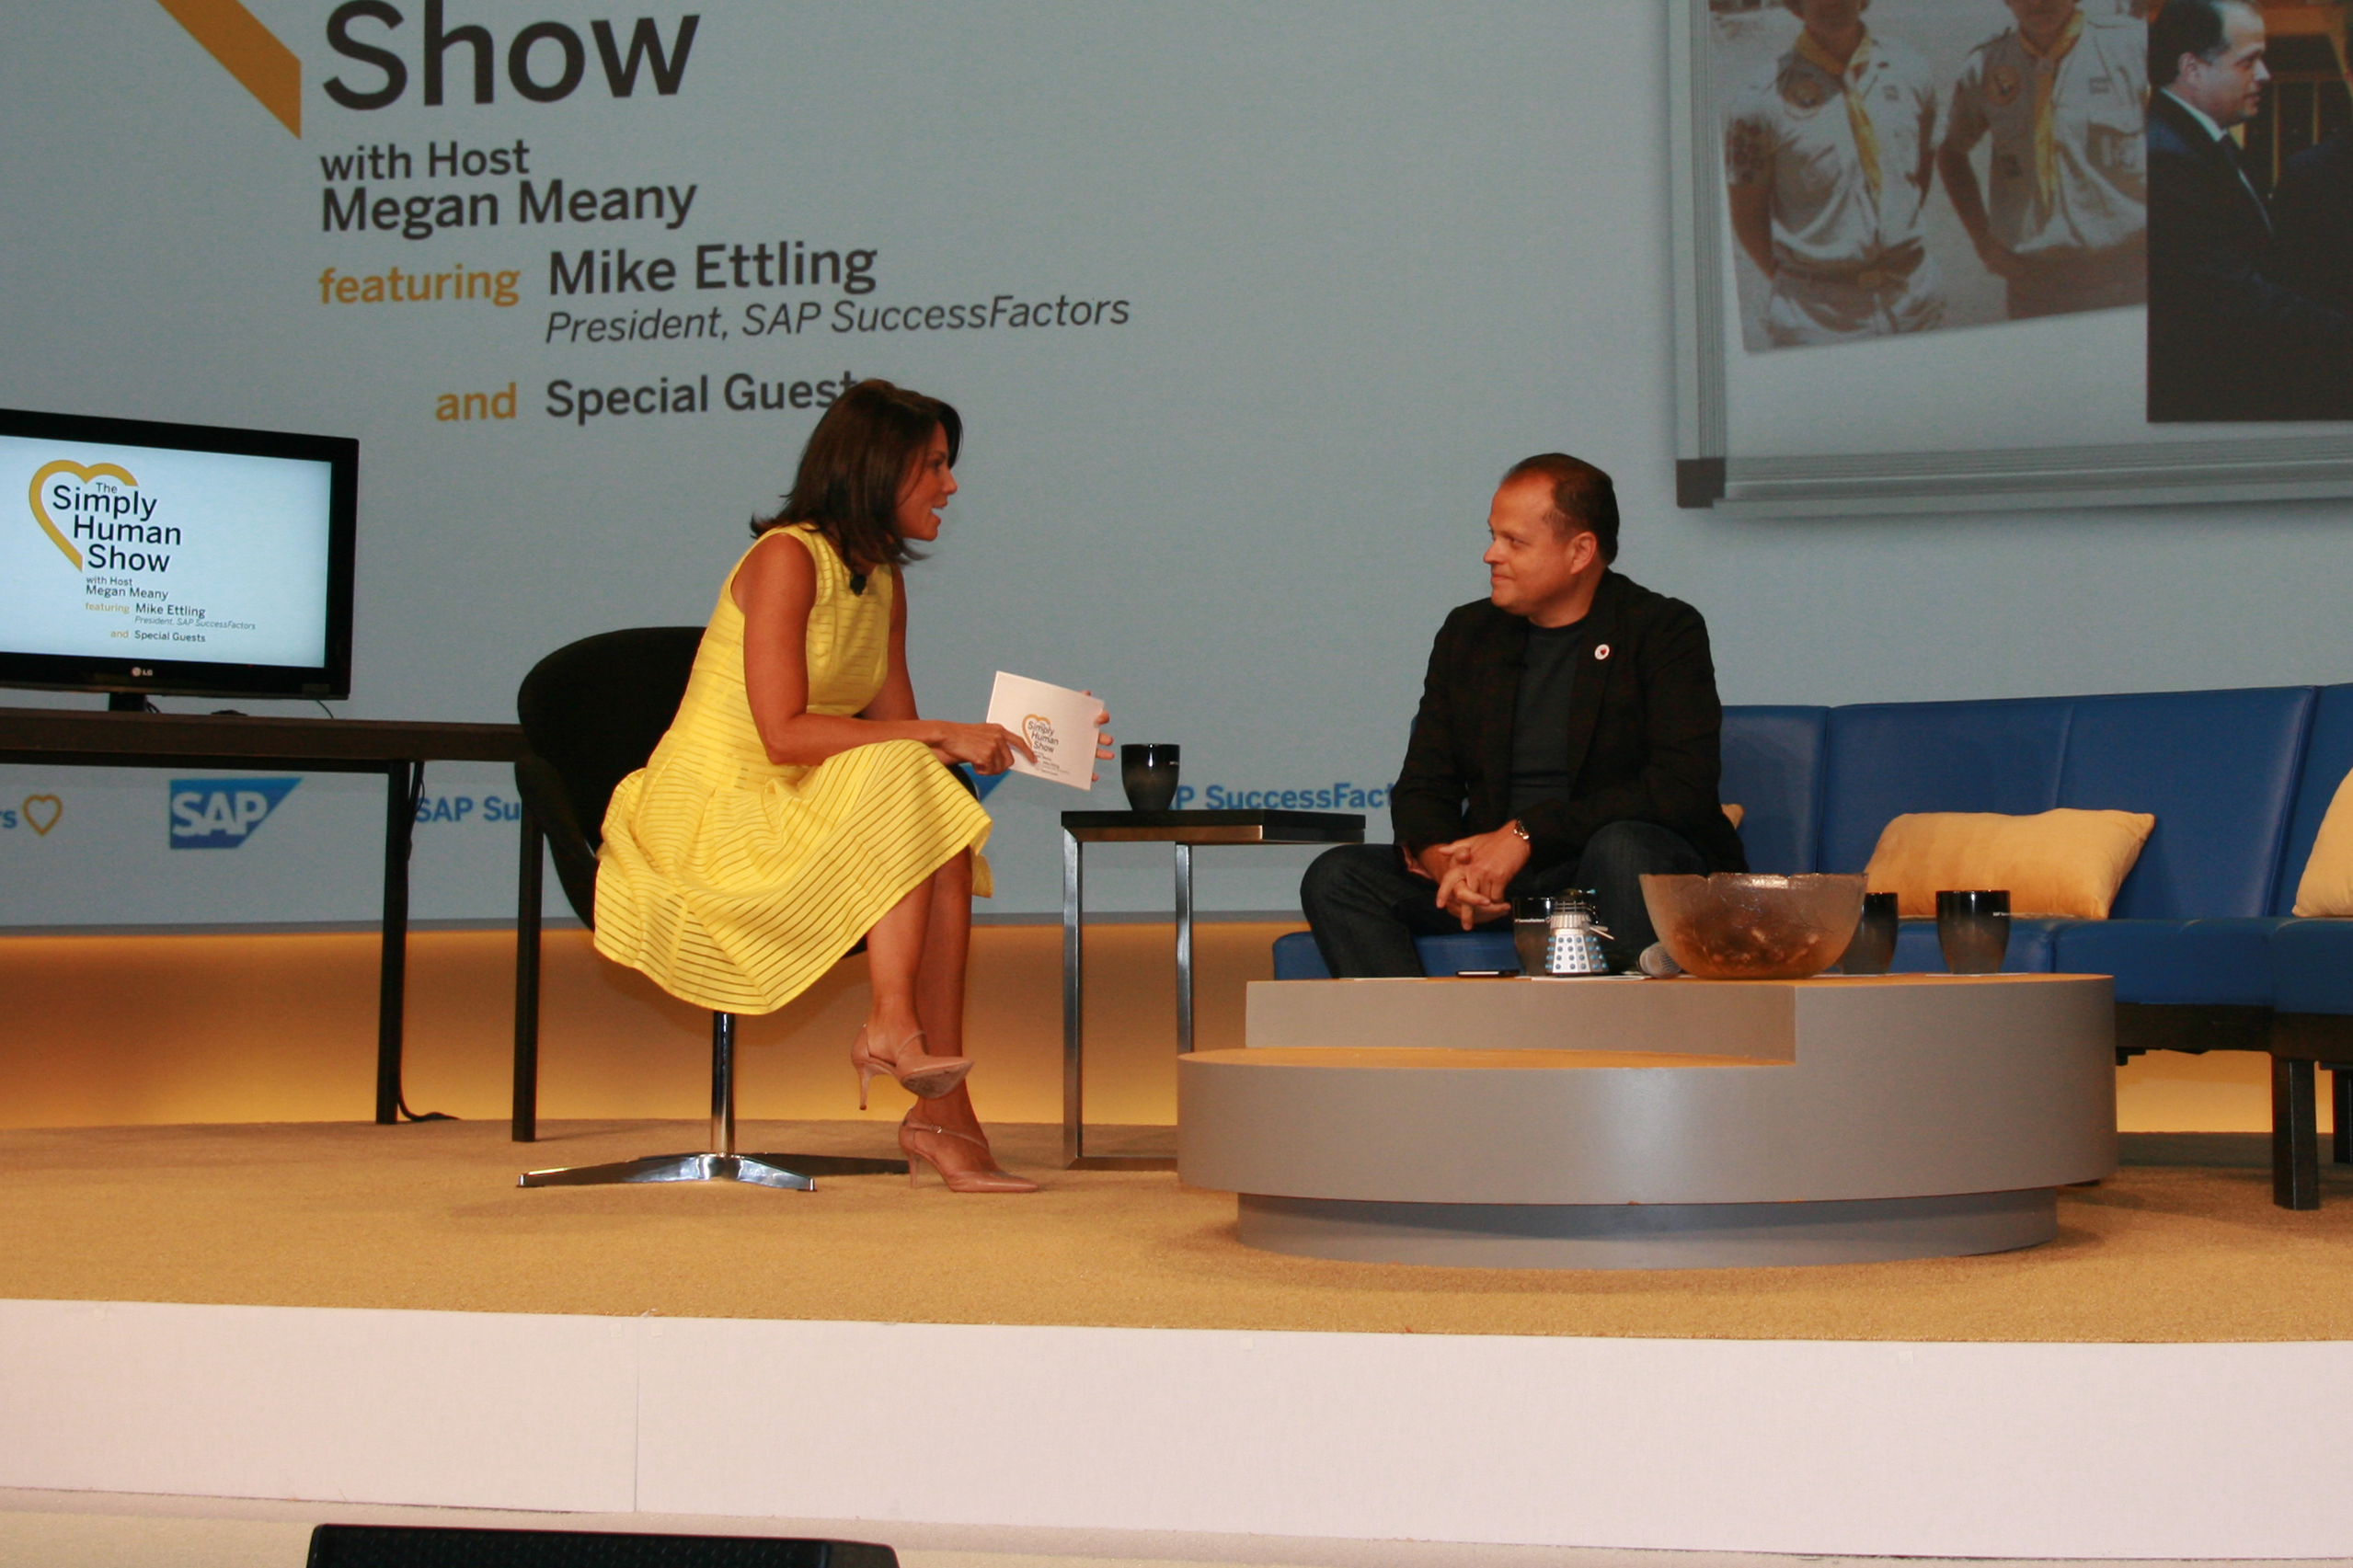 SAP Slideshow 4 - The Simply Human Show